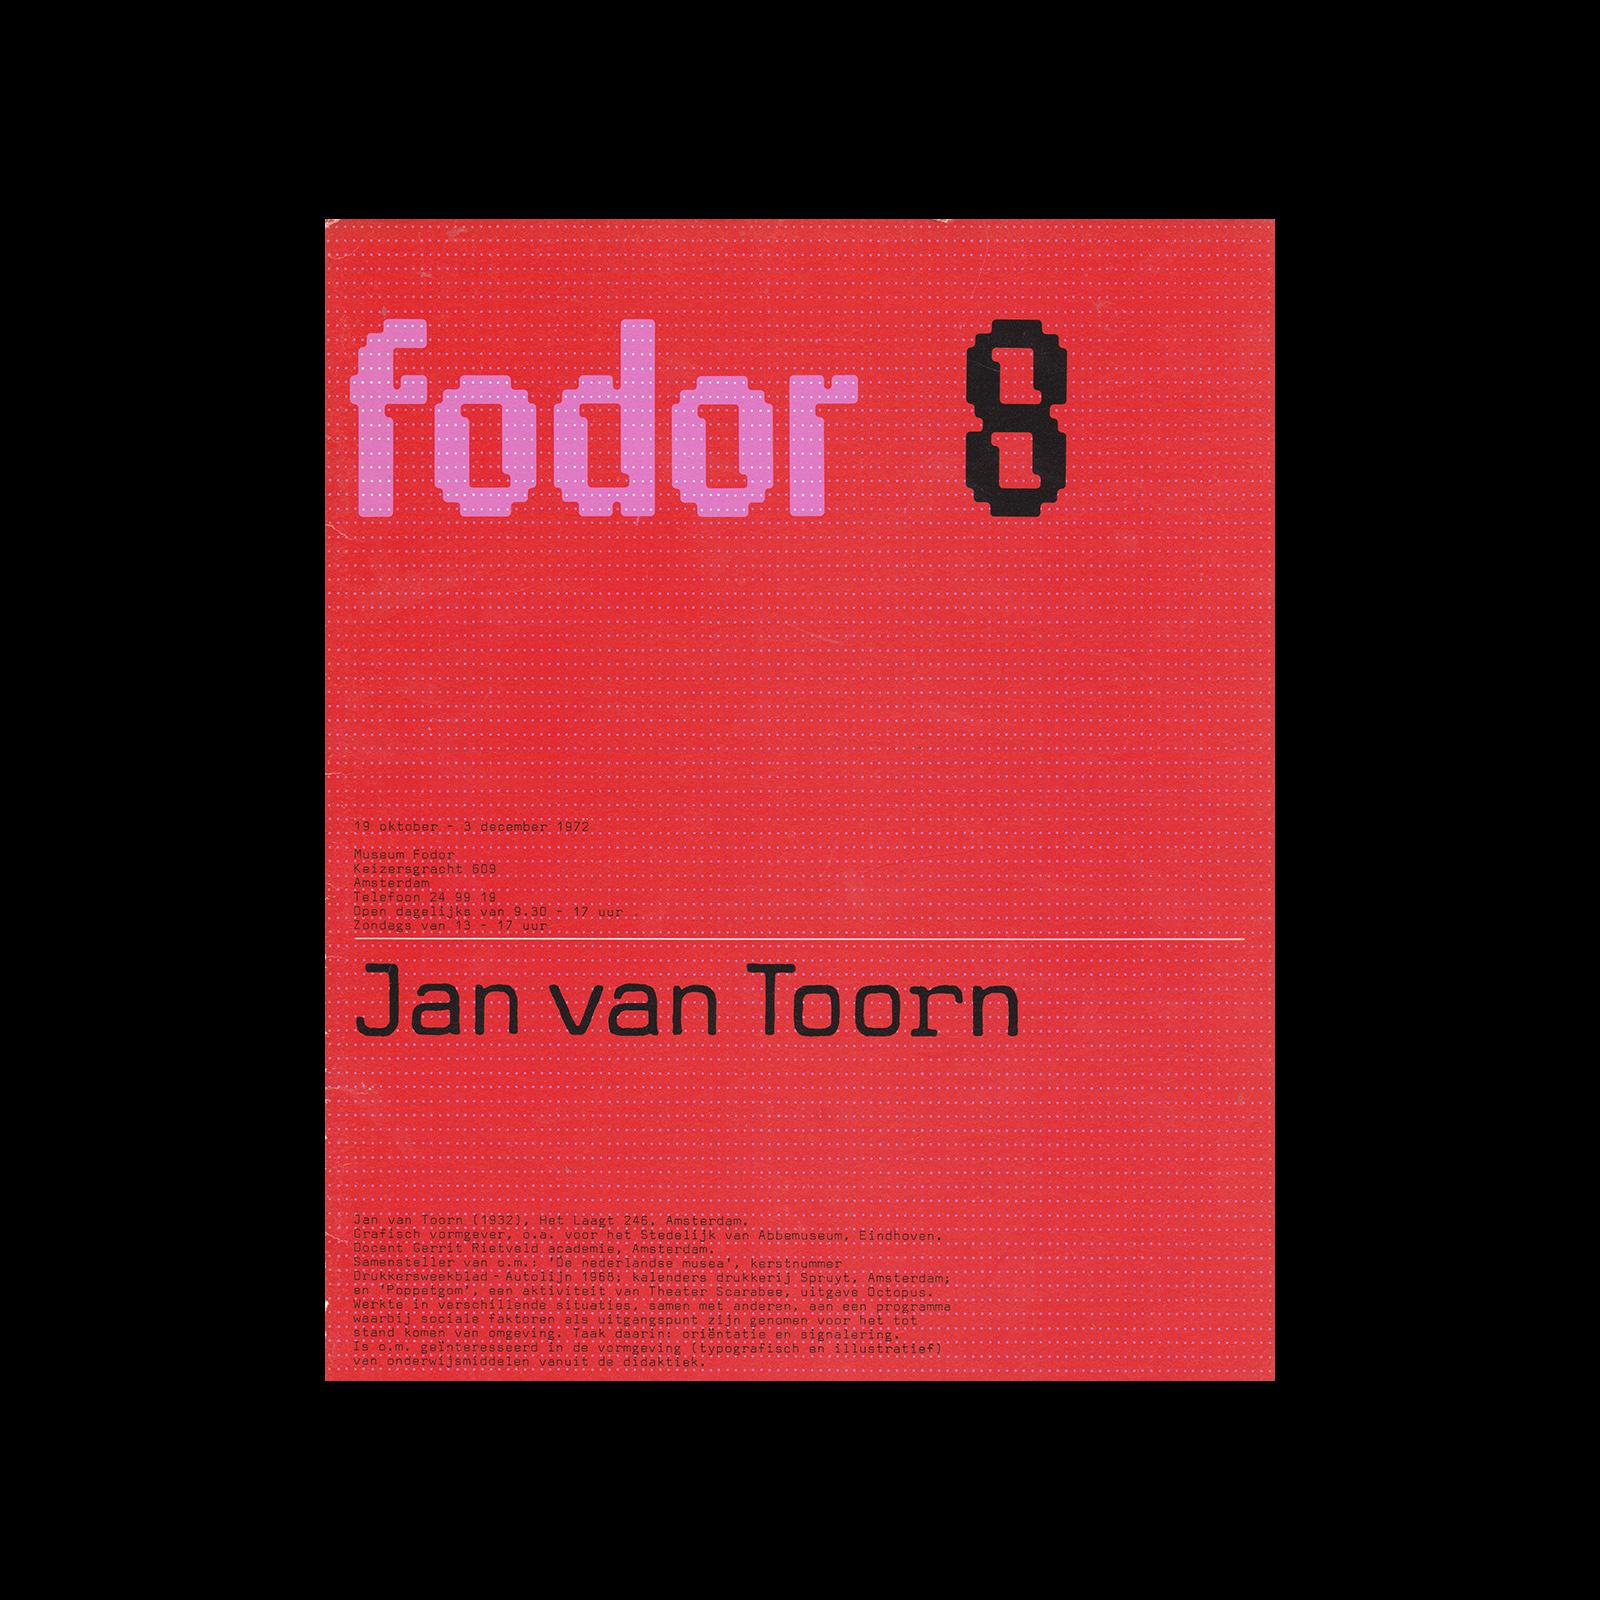 Fodor 8, 1972 - Jan van Toorn. Designed by Wim Crouwel